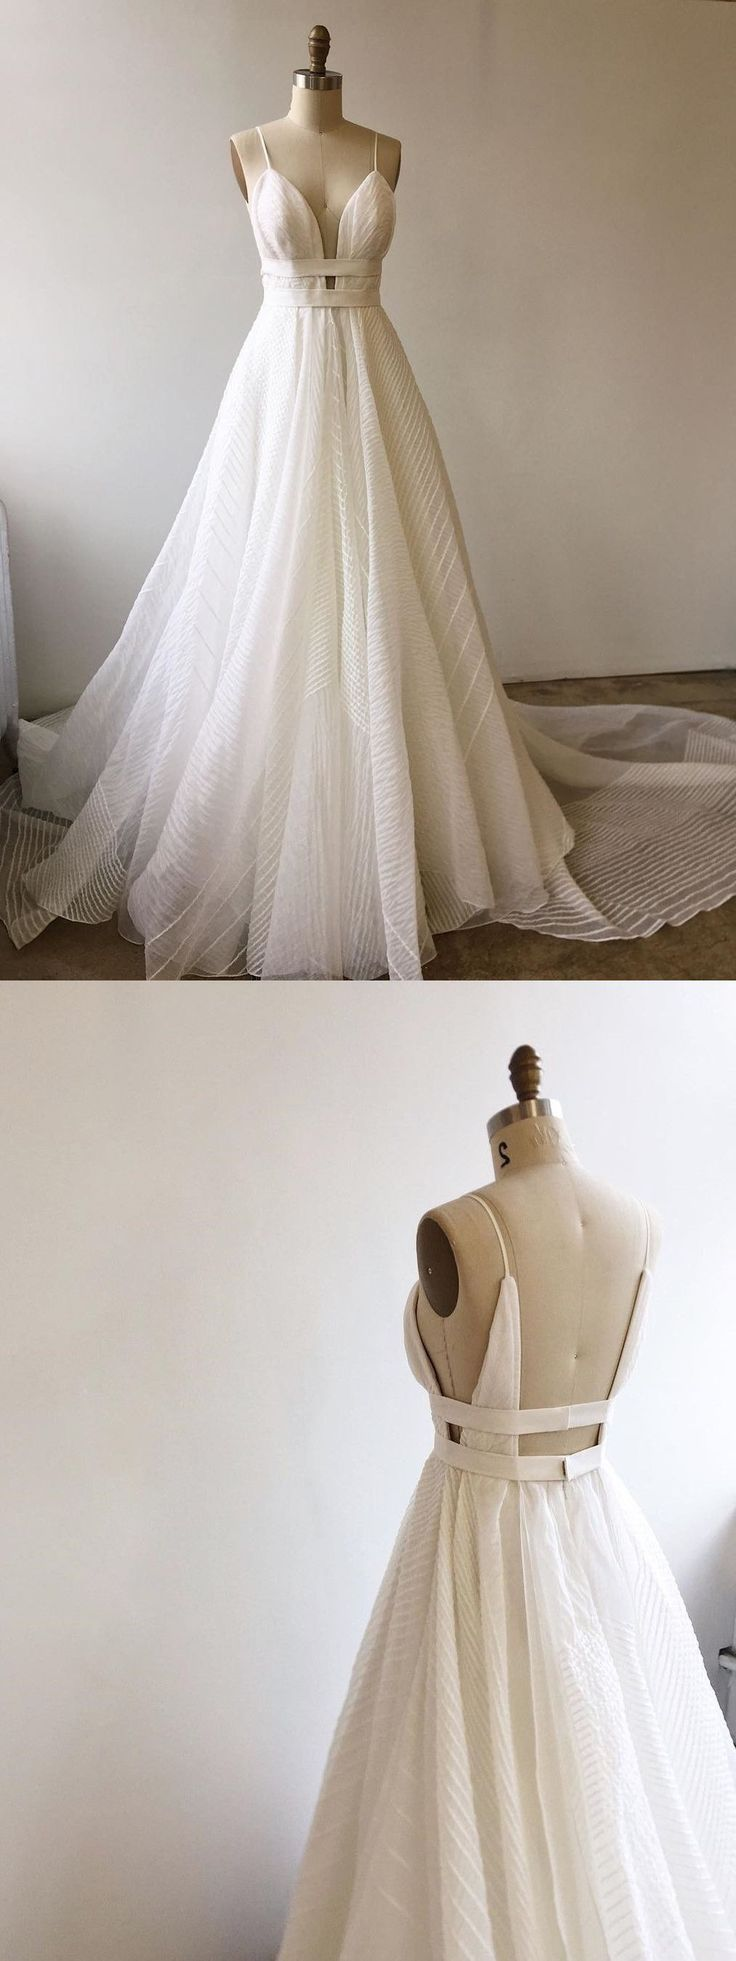 A-line Straps Long Wedding Dress, 2018 Wedding Dress, Ball Gown,White Long Wedding Dress with Train #weddingdress #whitewedding